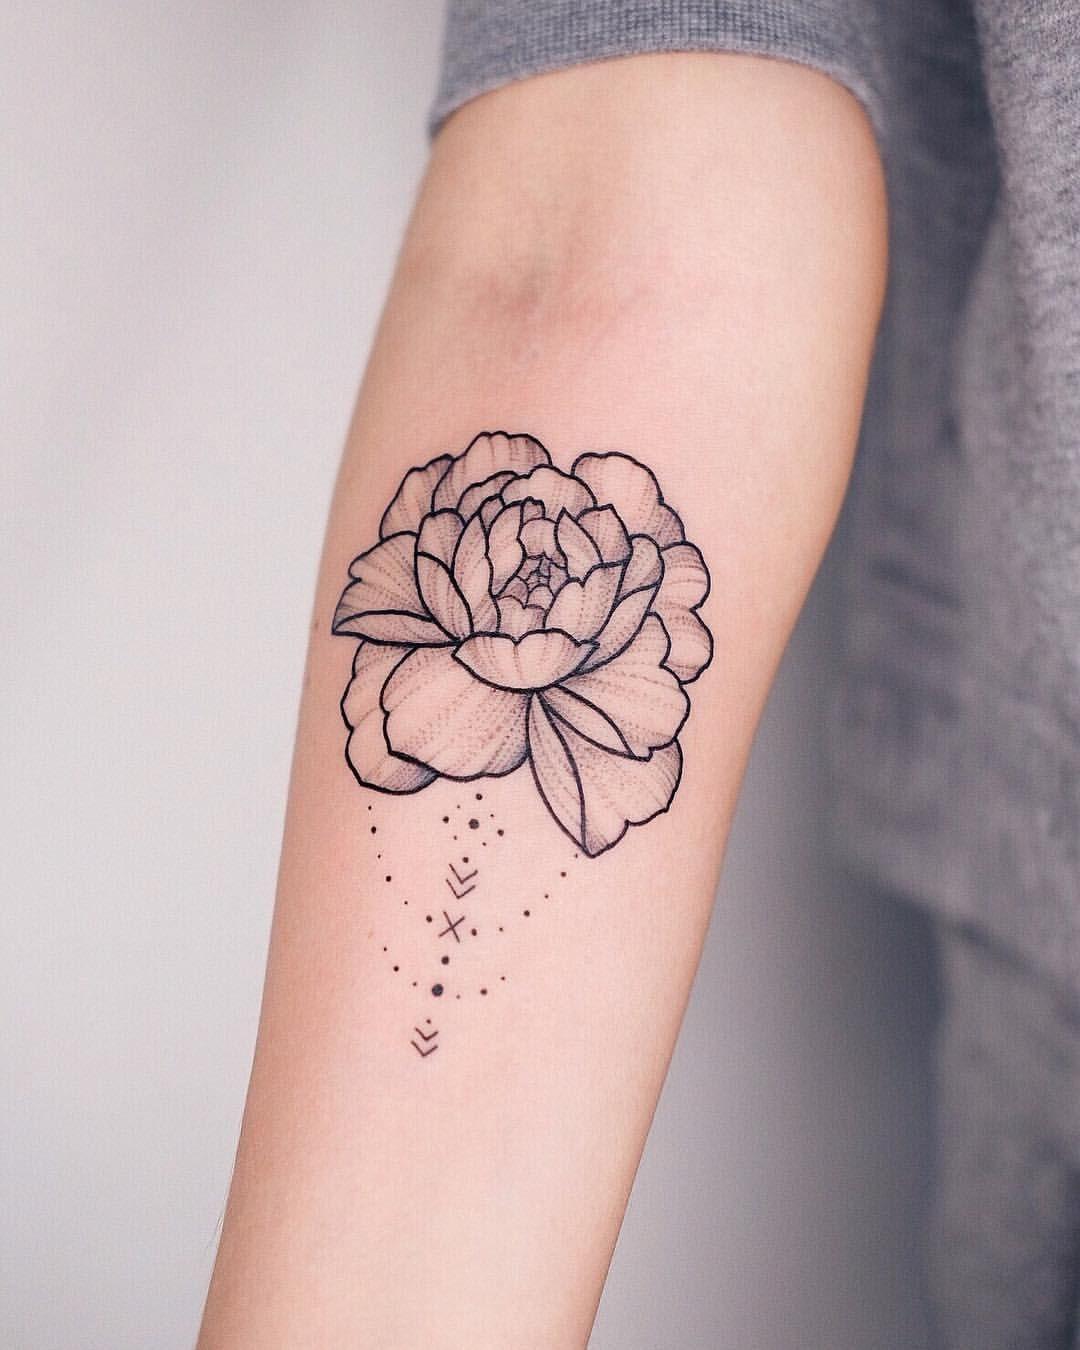 Pin De Andrew Mougios En Tattoos: Pin De Ely'z Gallegos G En Tattoos